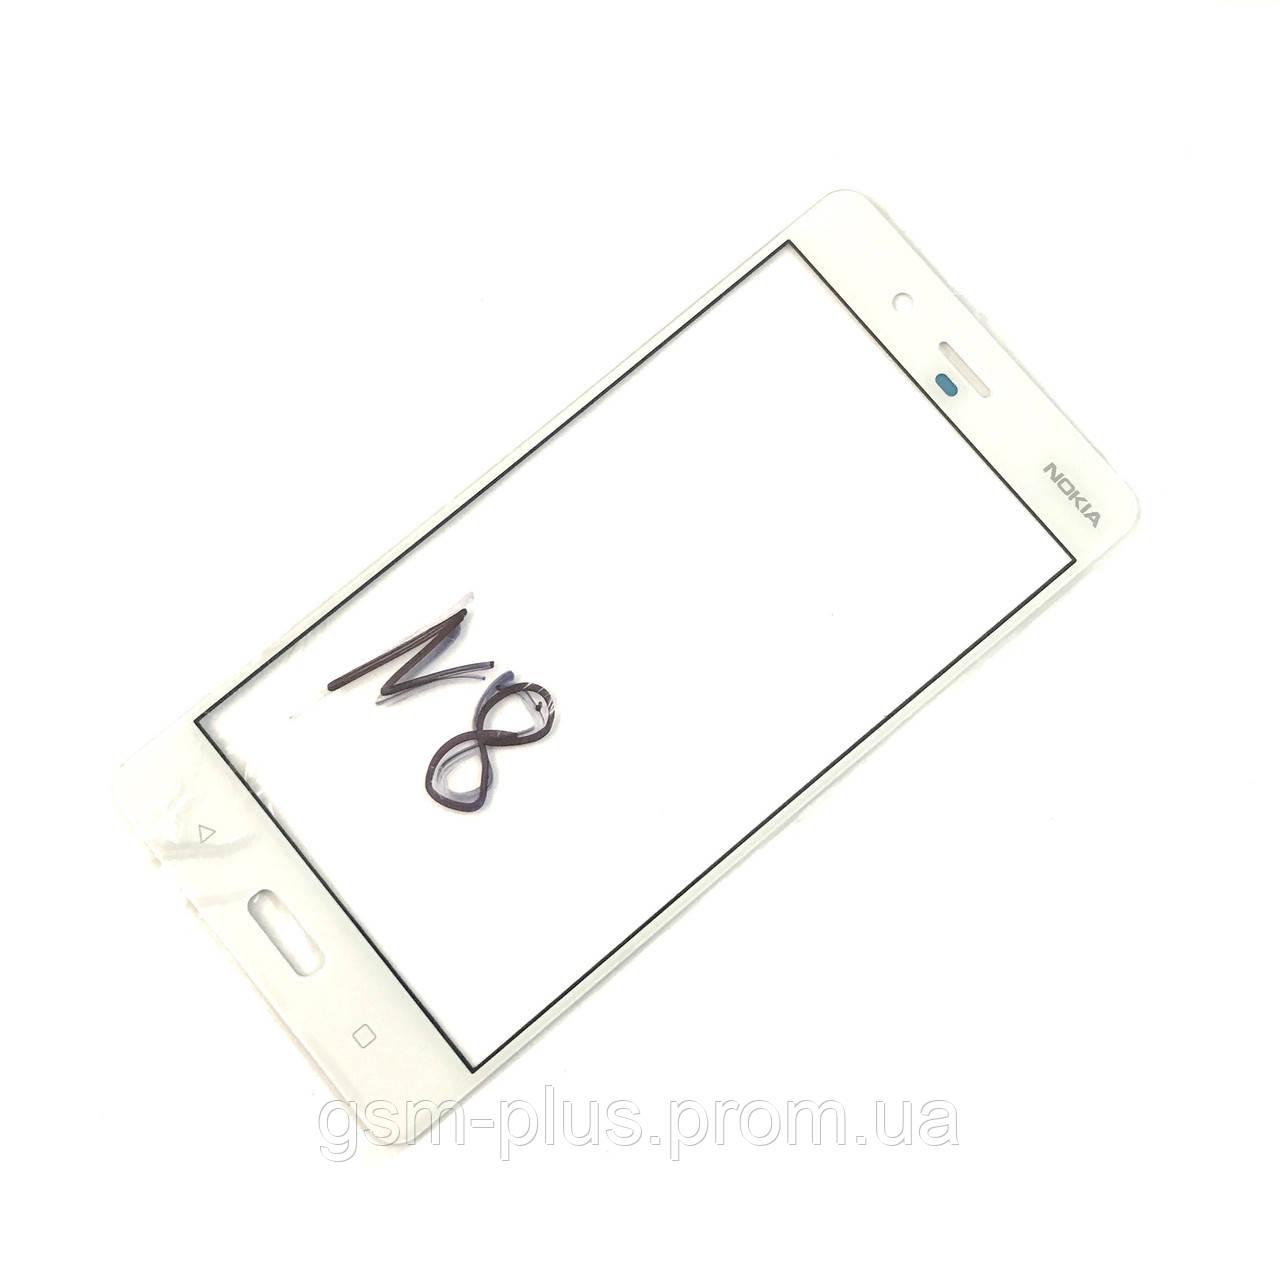 Стекло дисплея Nokia 8 White (для переклейки)